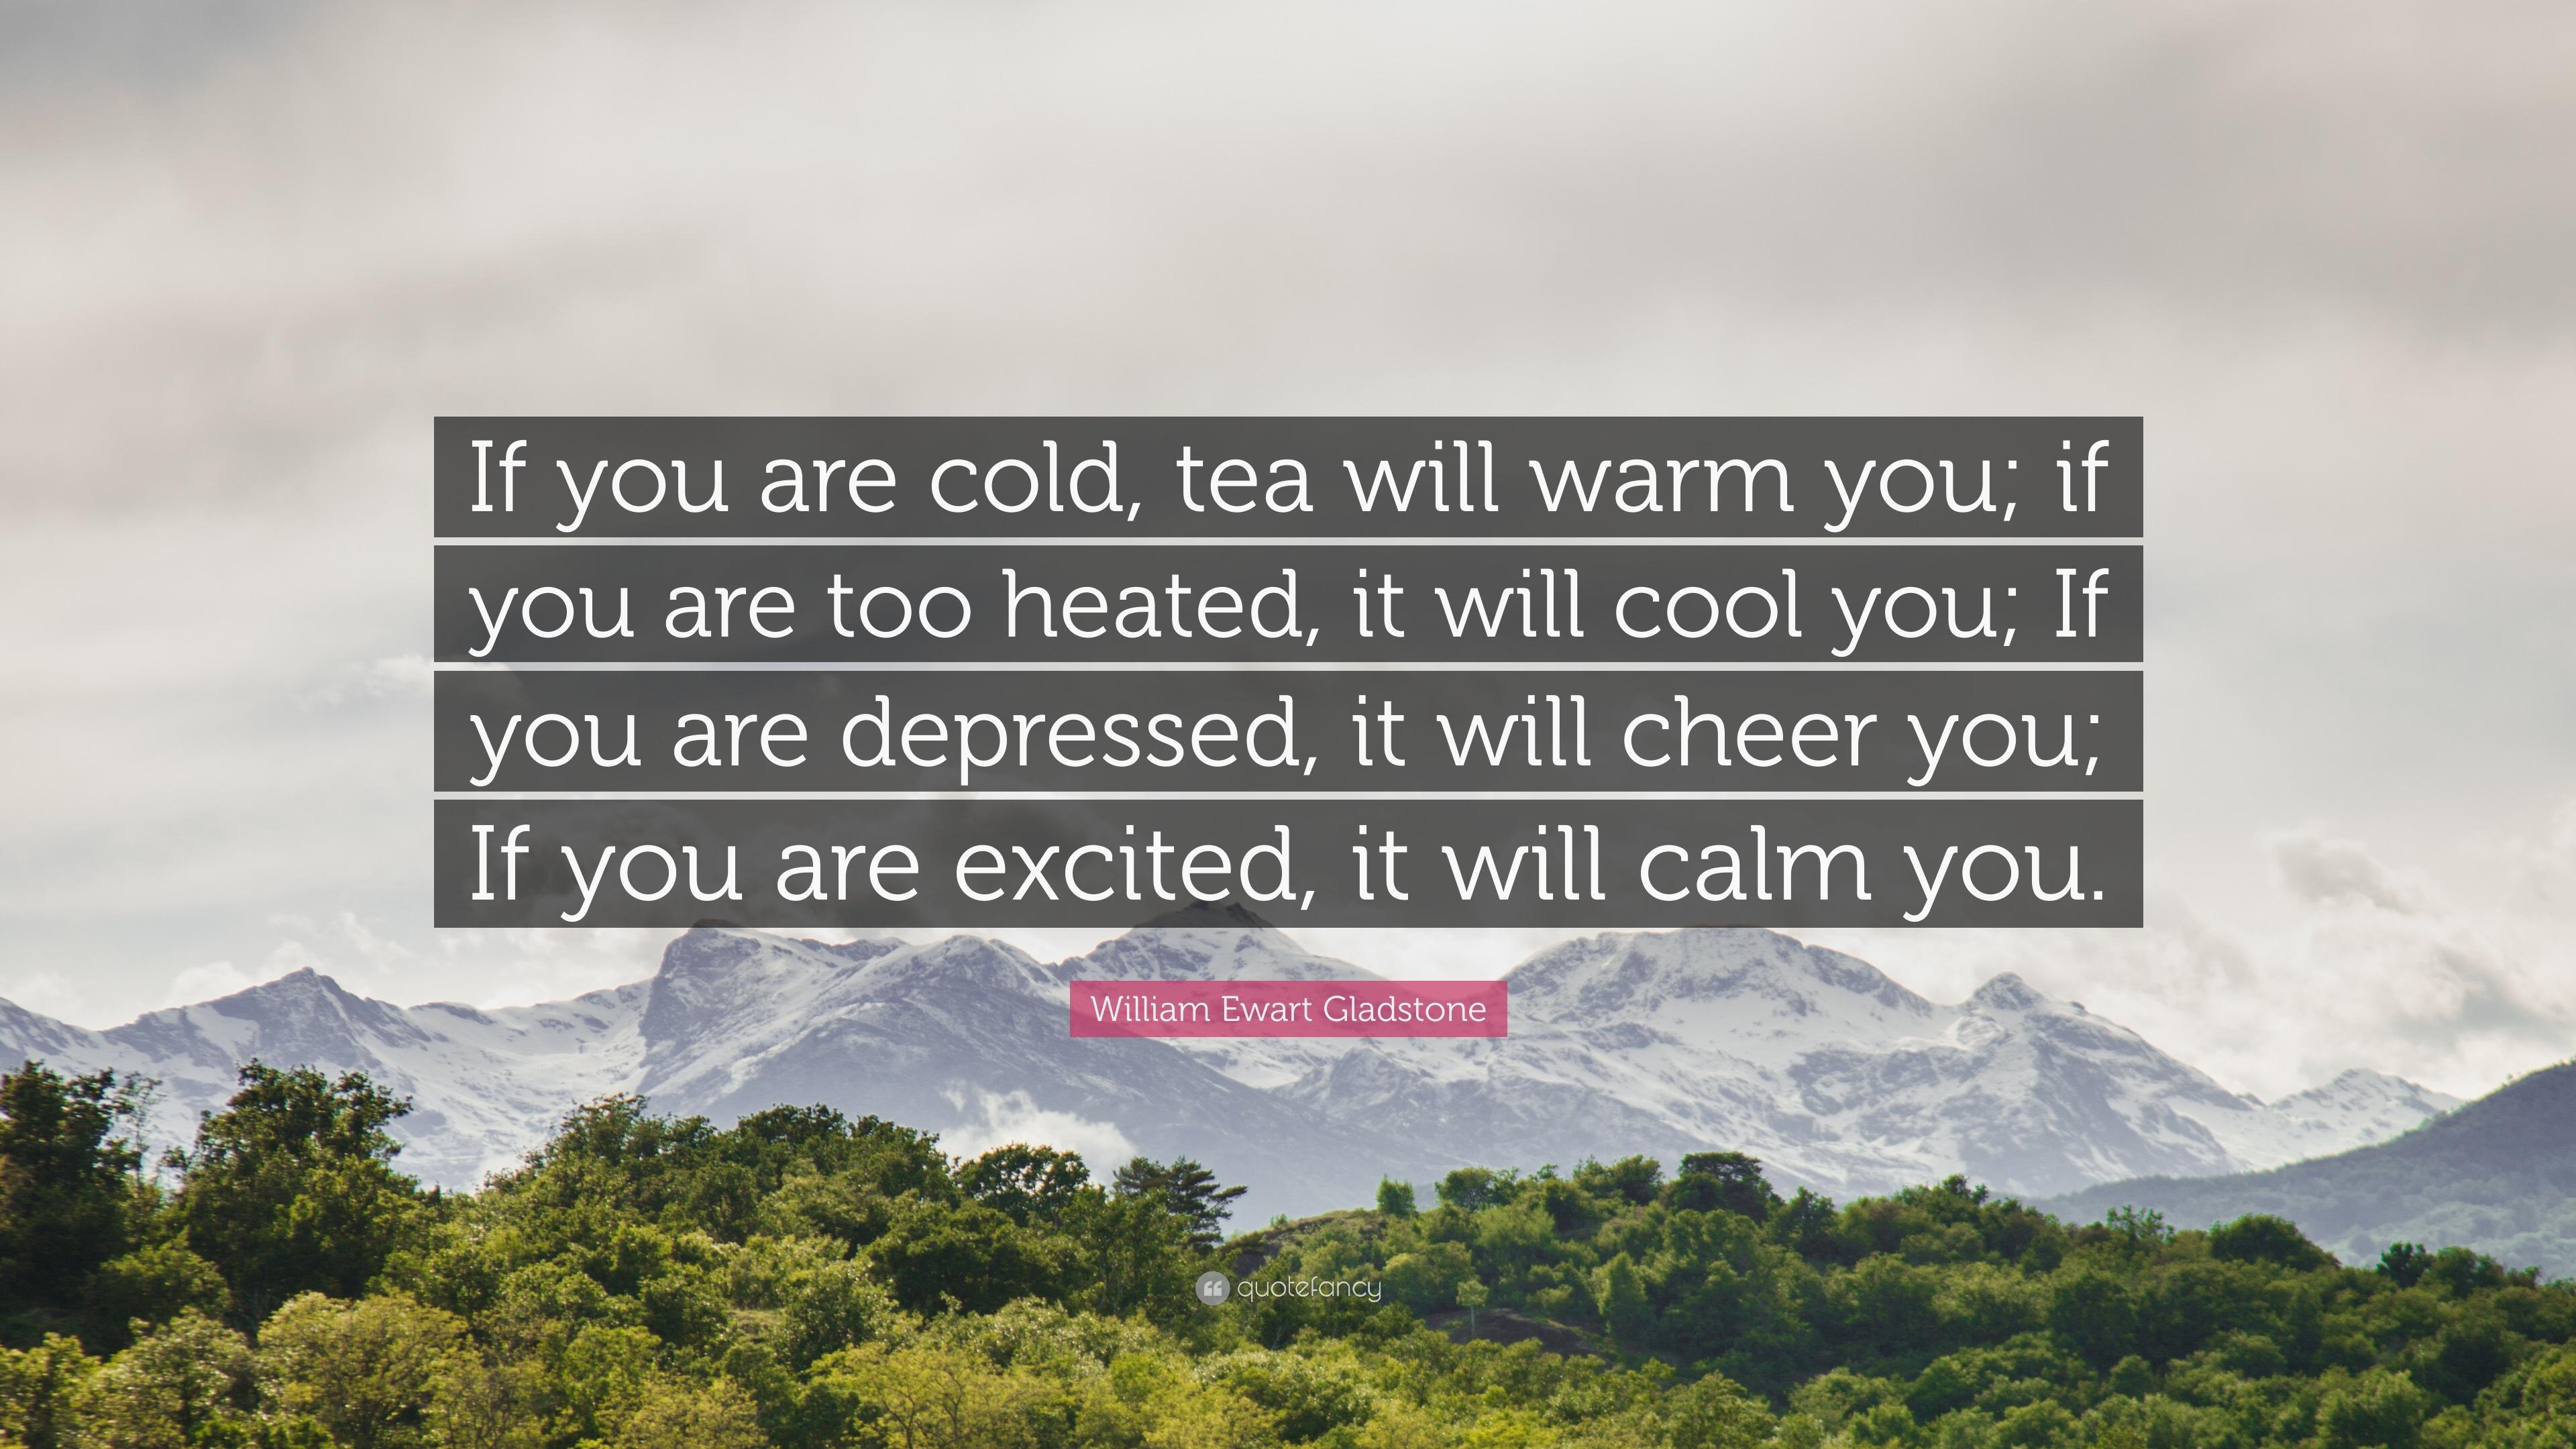 William ewart gladstone quote if you are cold tea will warm you william ewart gladstone quote if you are cold tea will warm you sciox Choice Image